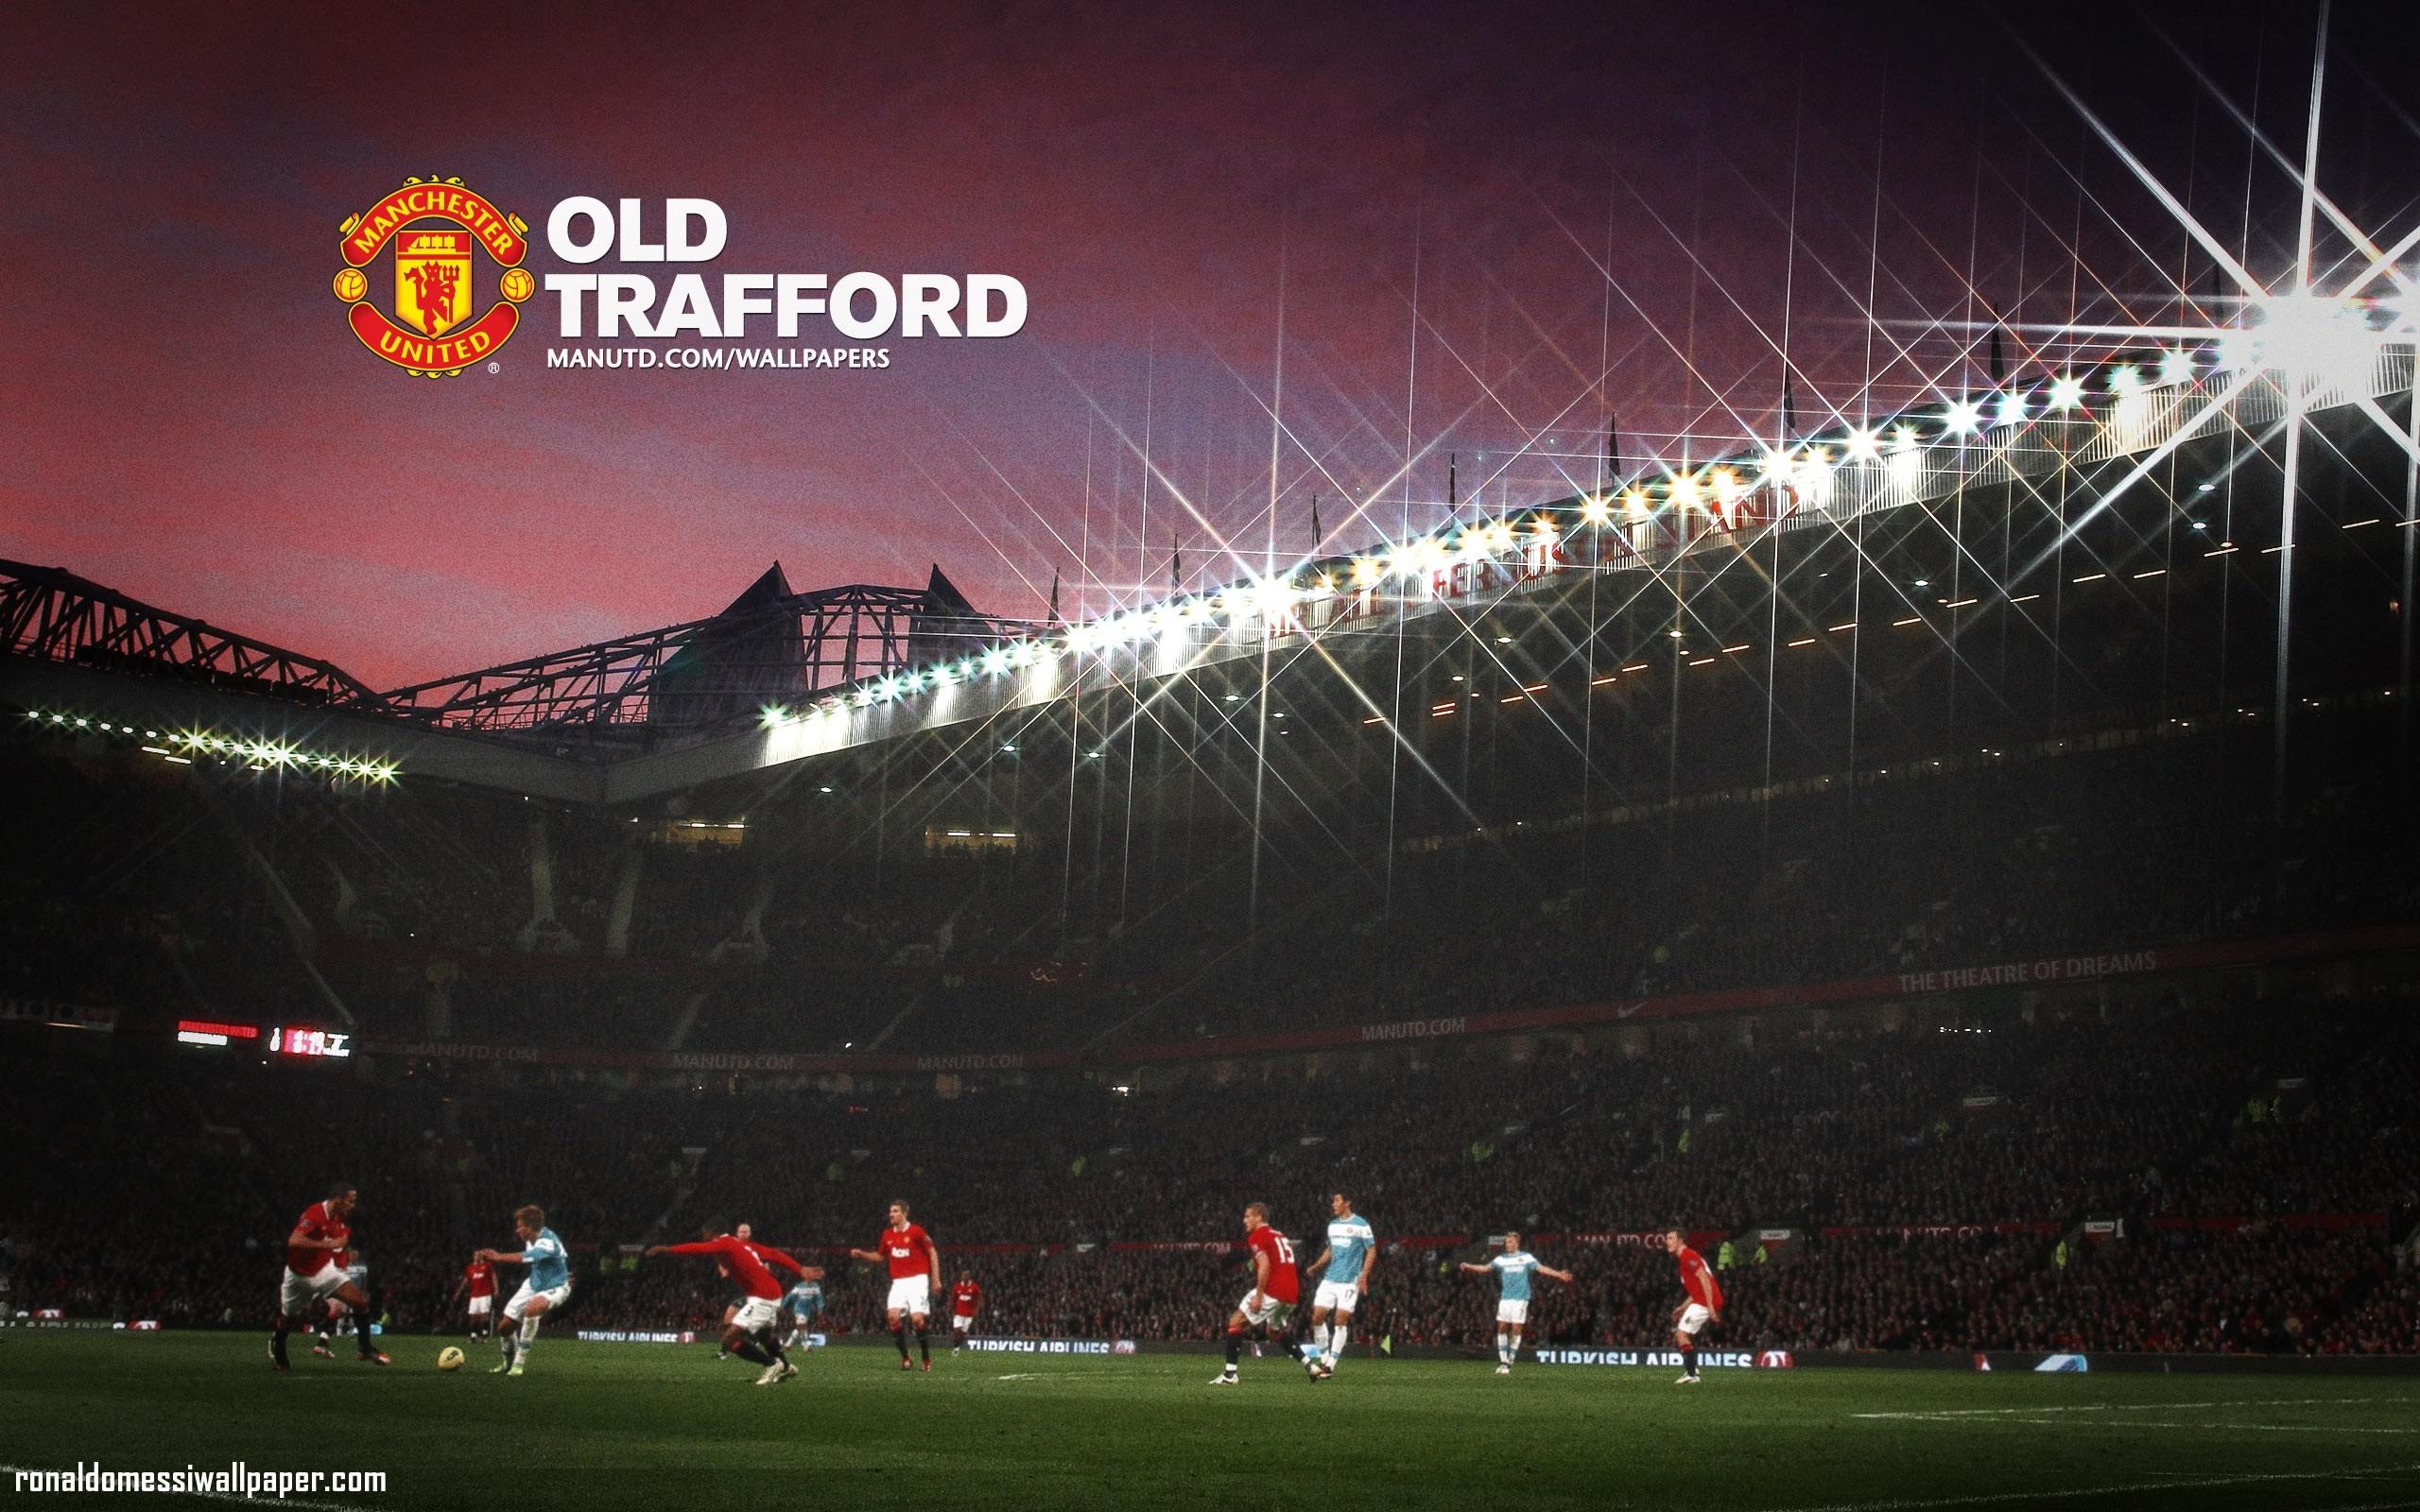 Old Trafford Manchester United Wallpaper Data Src Old Trafford Wallpaper 4k 2560x1600 Wallpaper Teahub Io